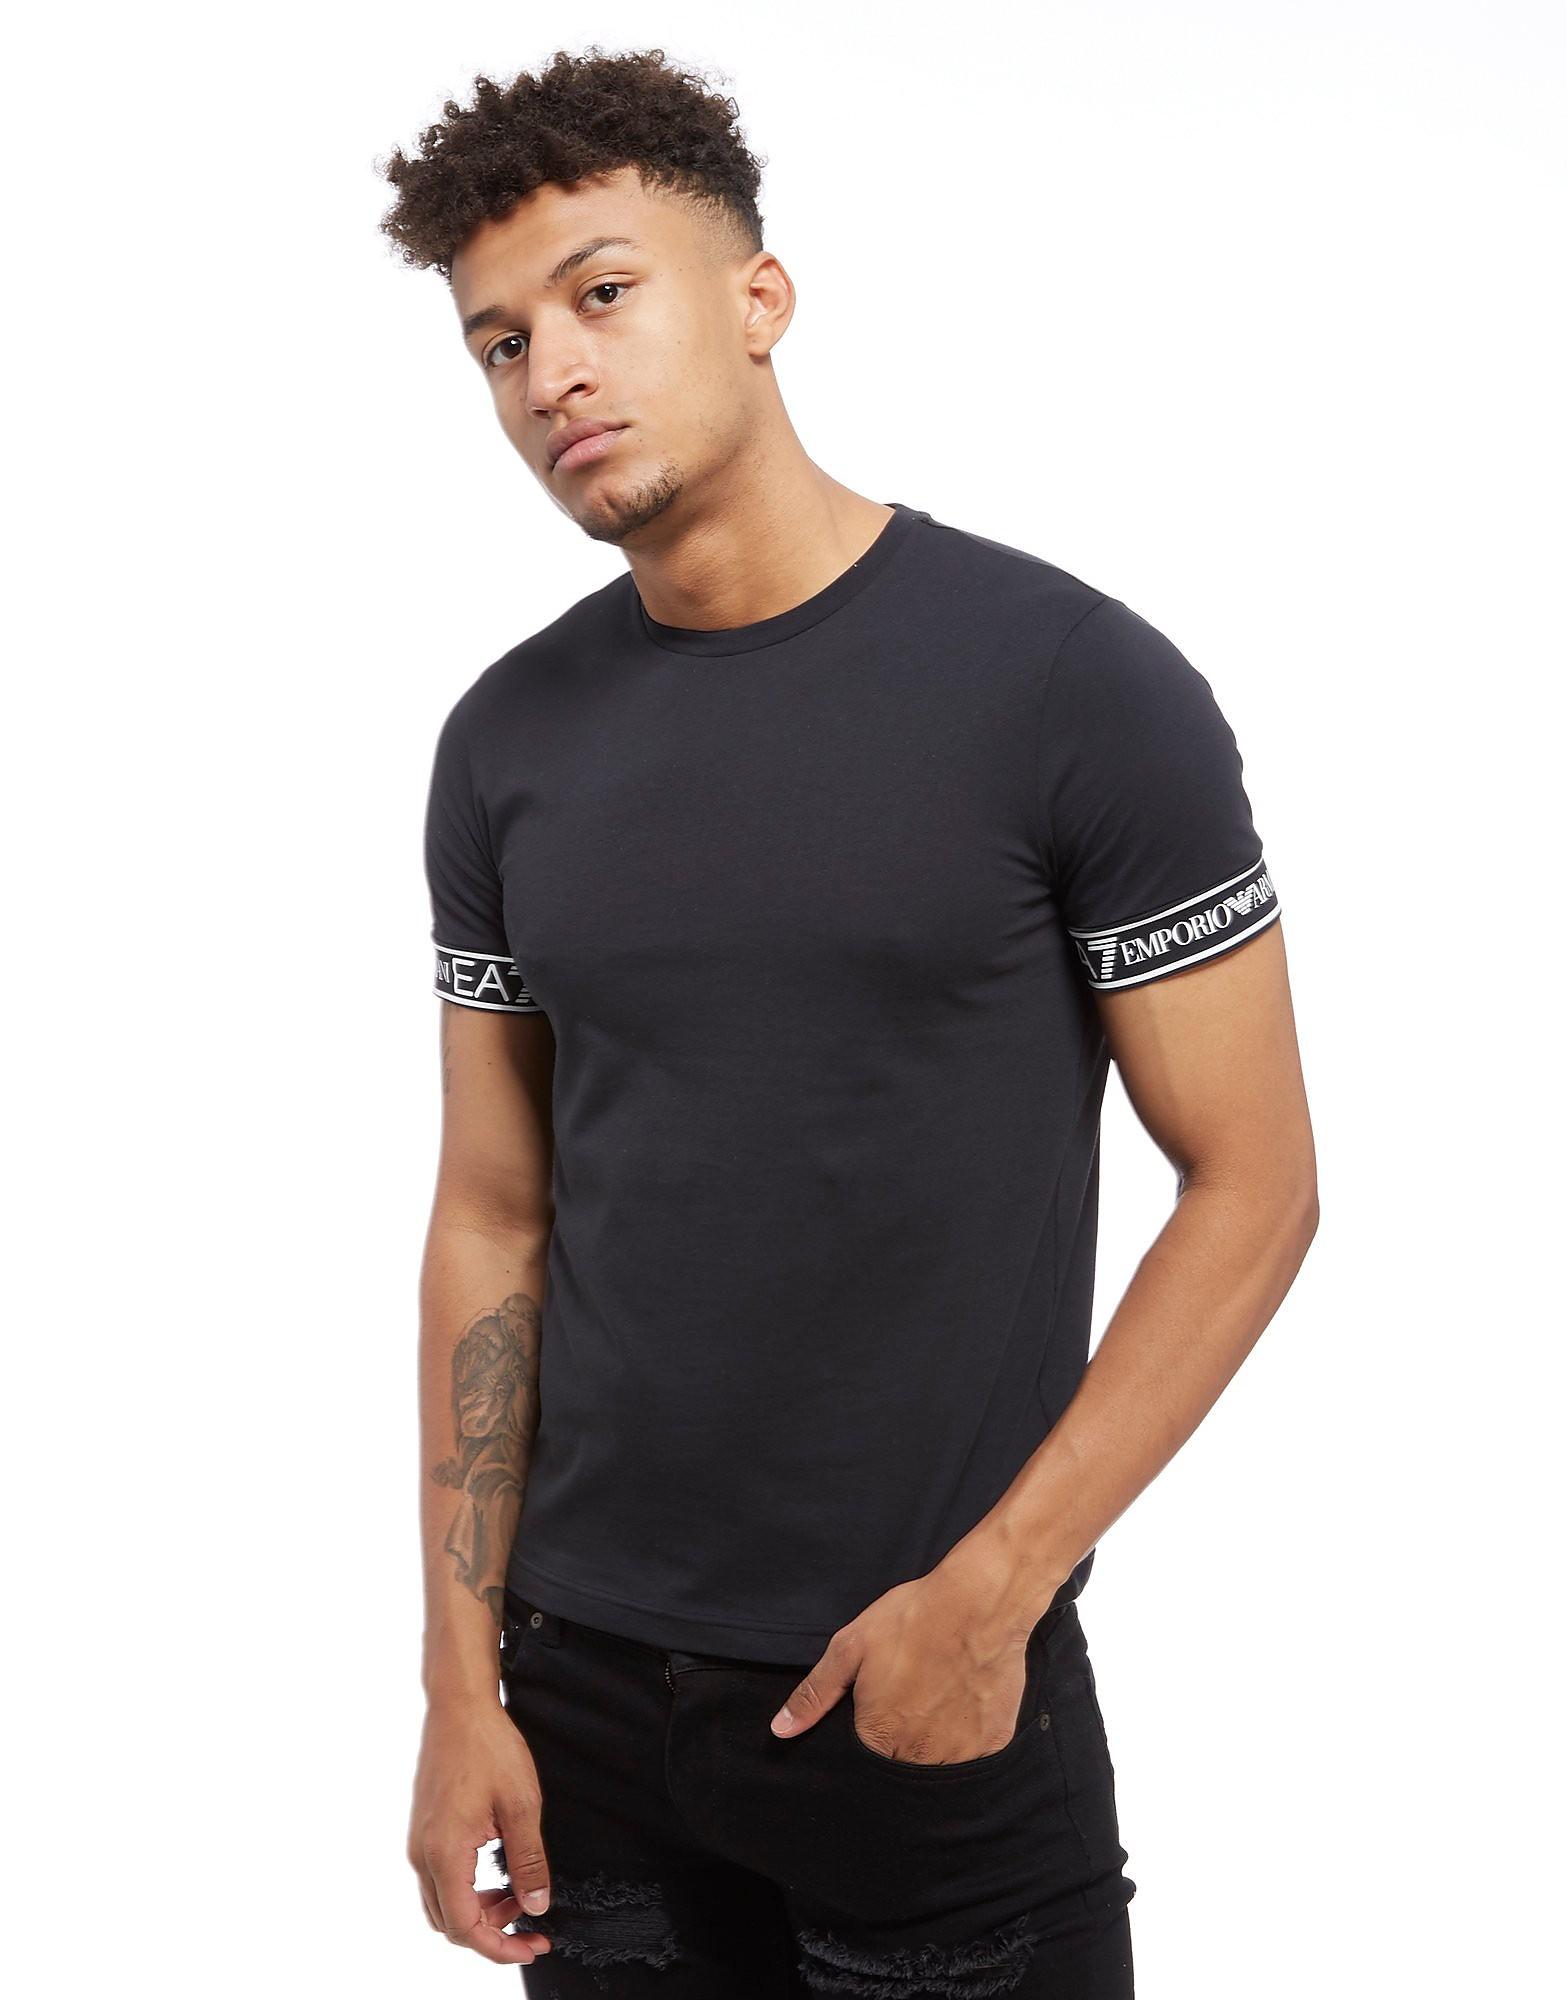 Emporio Armani EA7 Short Sleeve Print T-Shirt